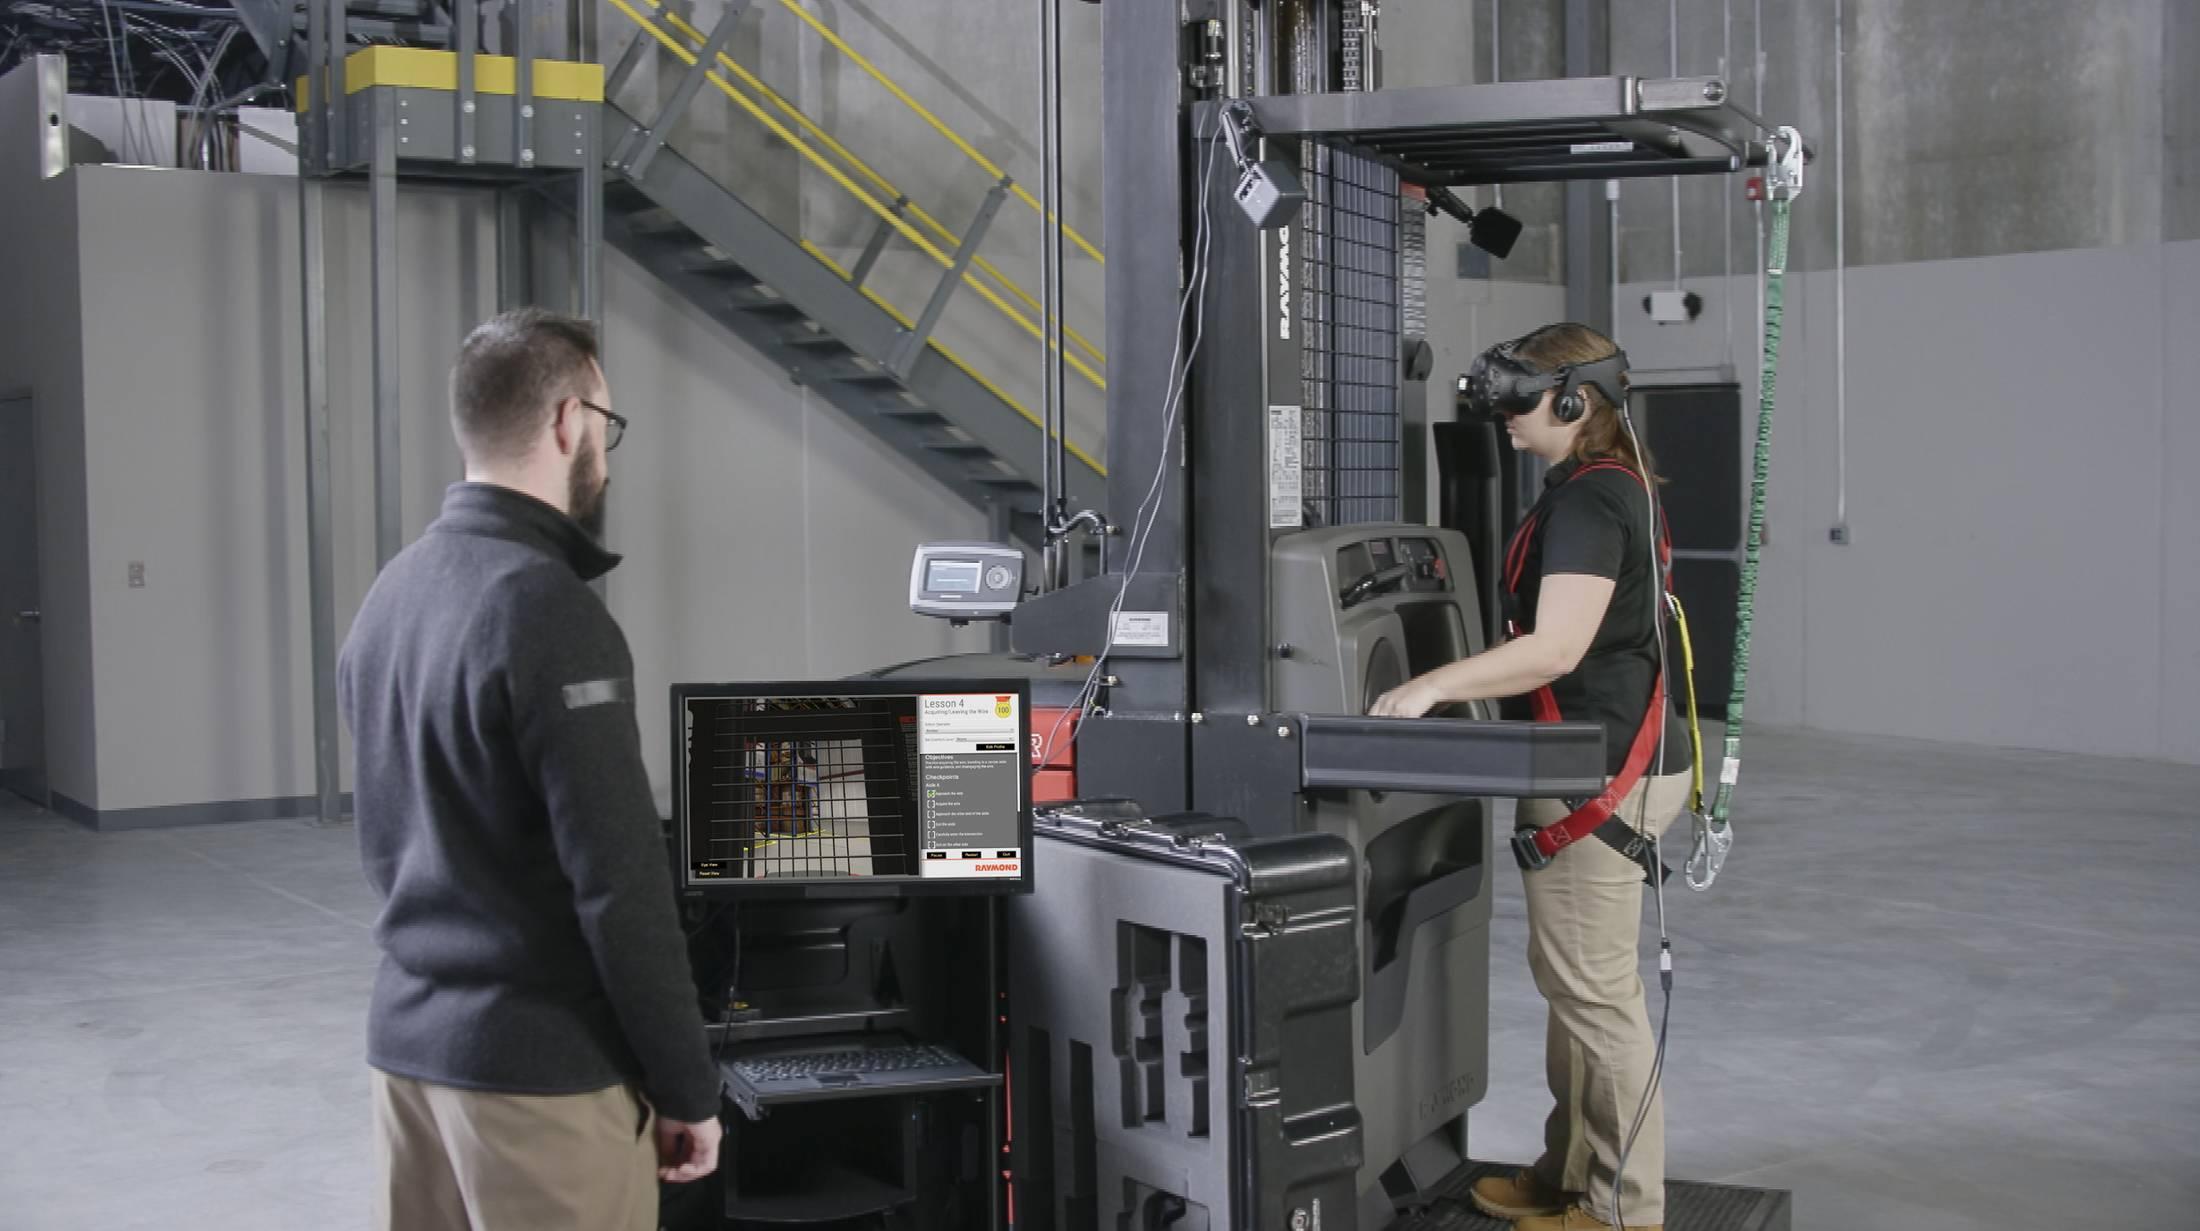 HTC Debuts New Vive Pro Virtual Reality Kit in Big Business